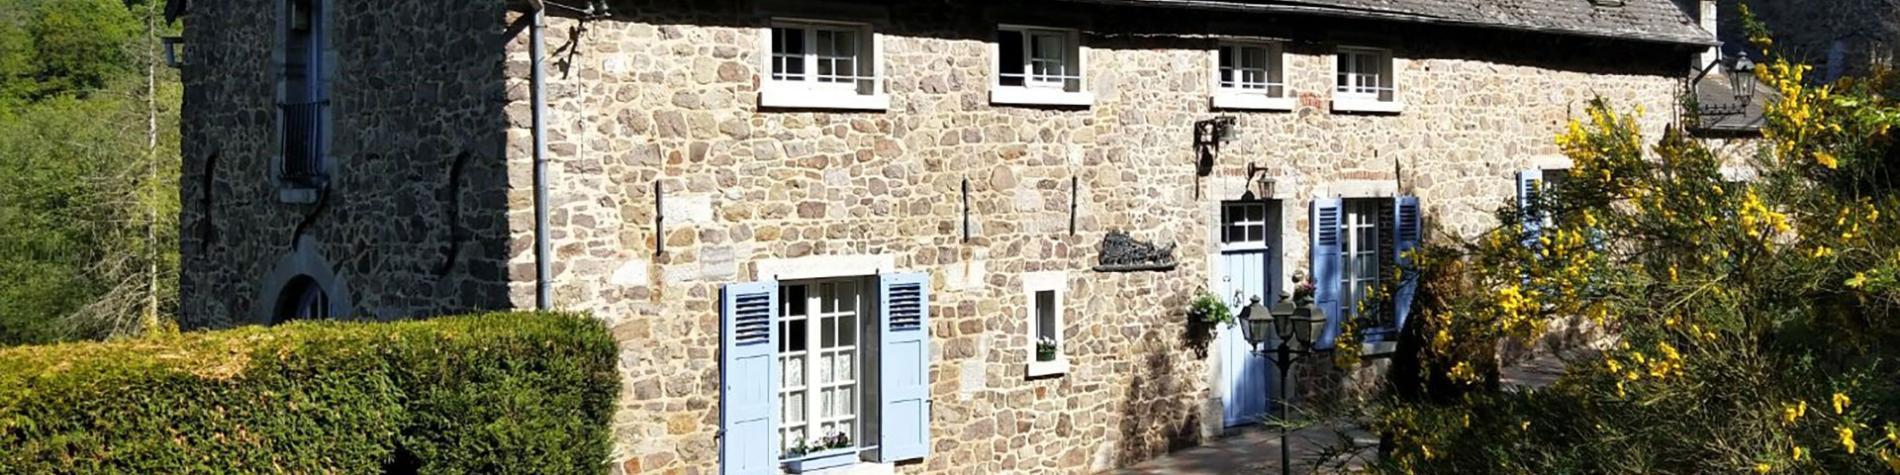 Gîte rural - Haut Marteau - Thuin